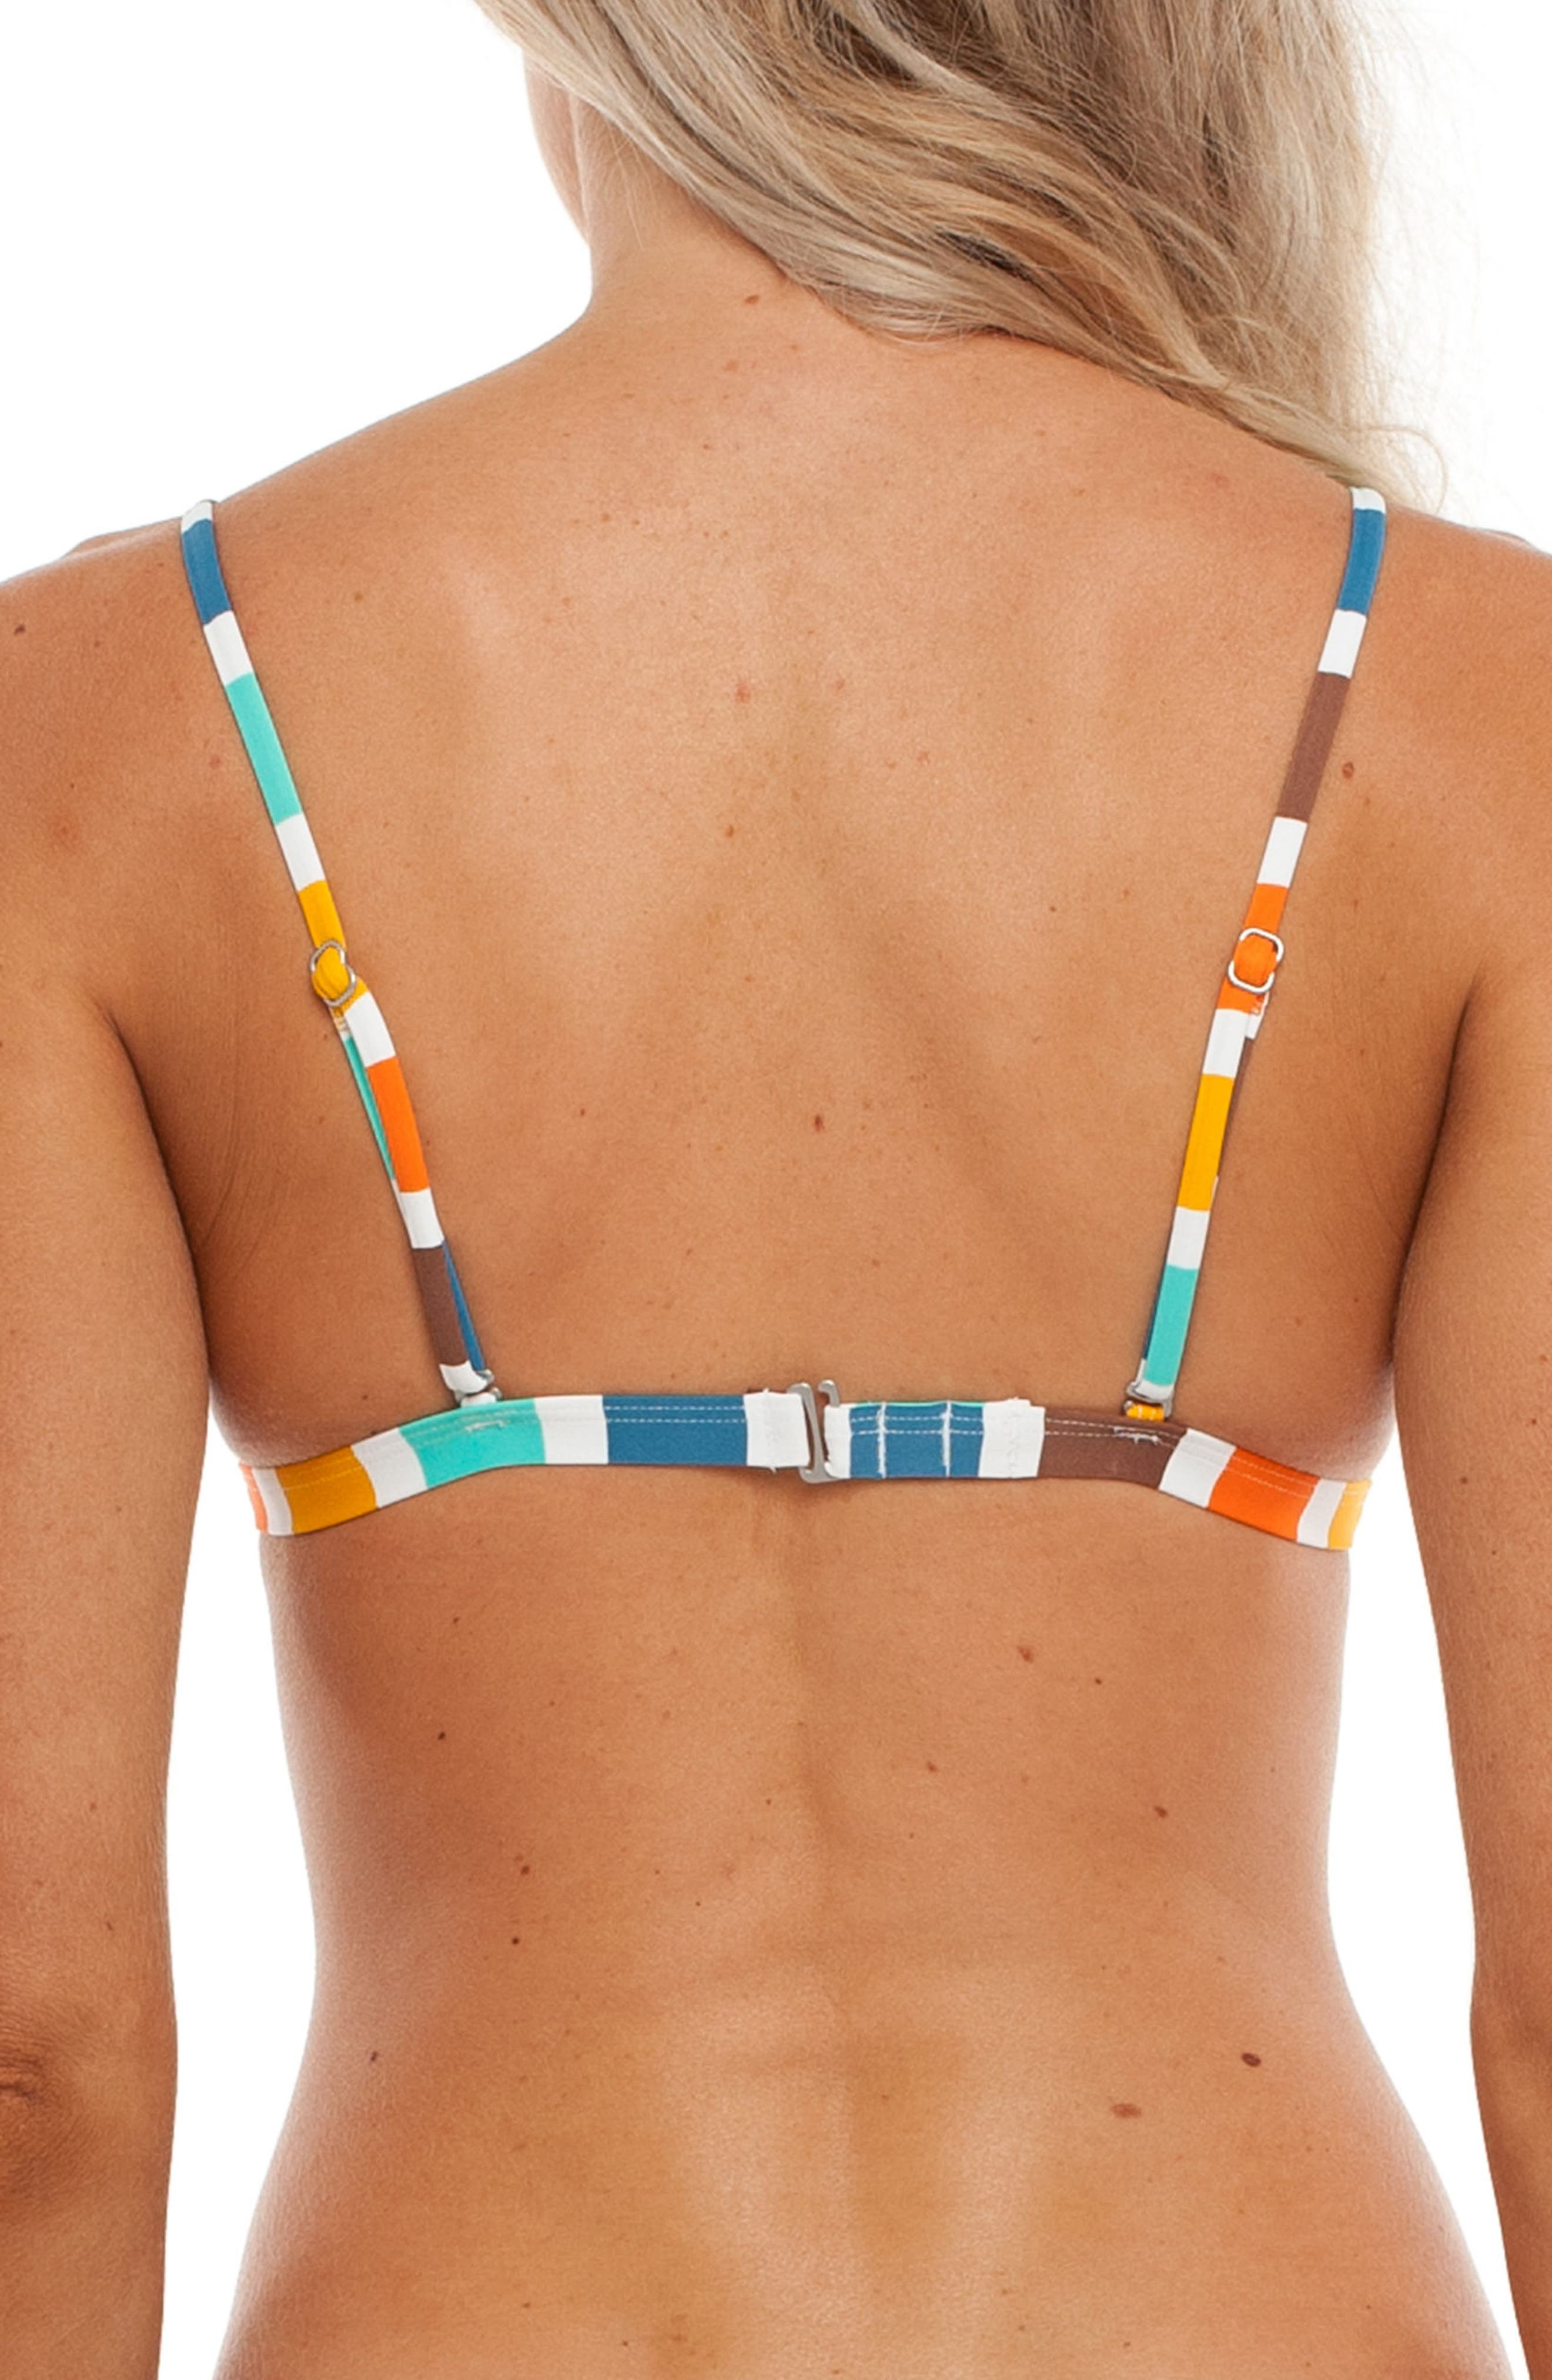 Zimbabwe Bralette Bikini Top,                             Alternate thumbnail 2, color,                             Tangelo Multi